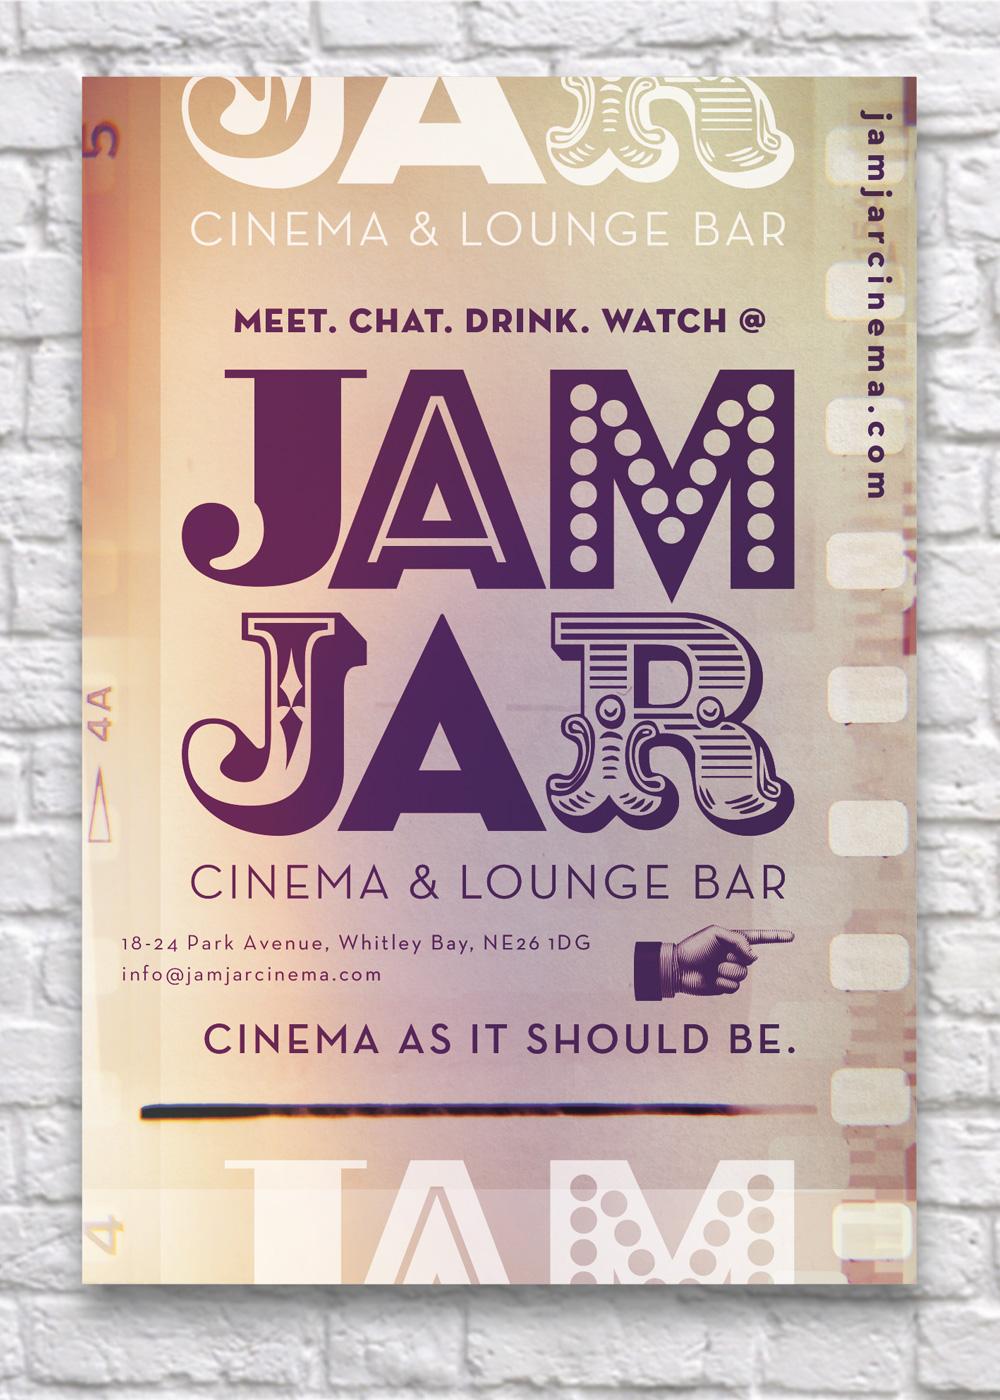 Jam Jar Cinema and Lounge Bar